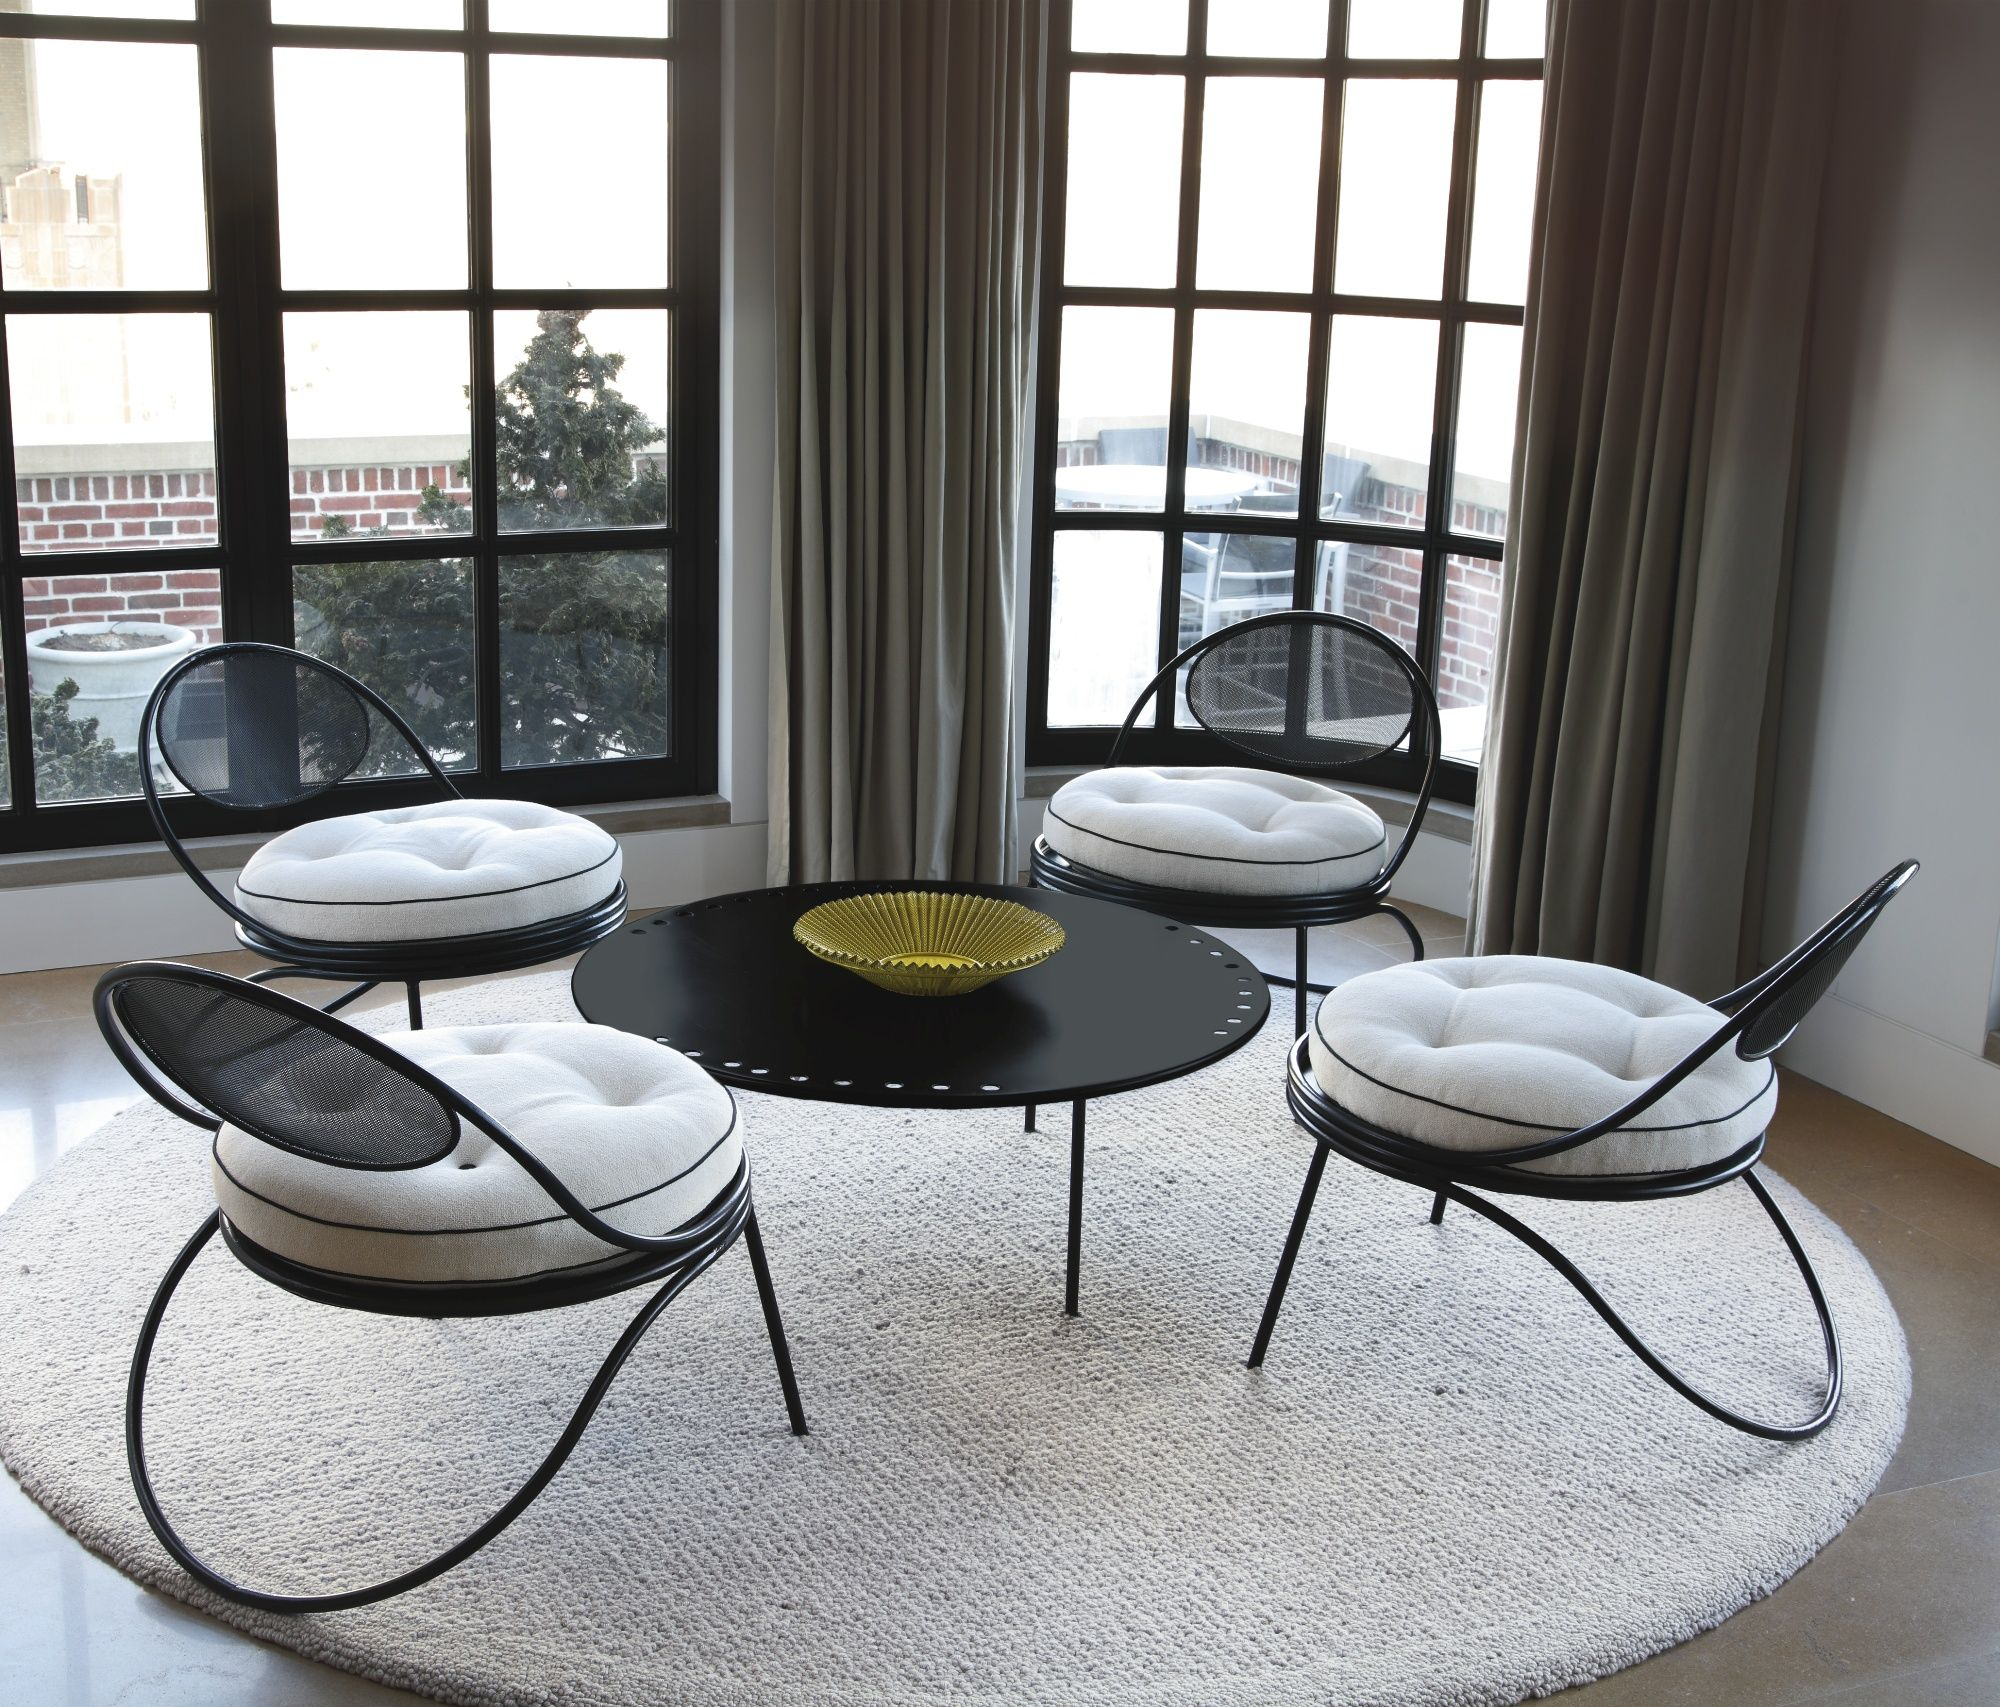 GUBI Copacabana table and chairs by Mathieu Mategot